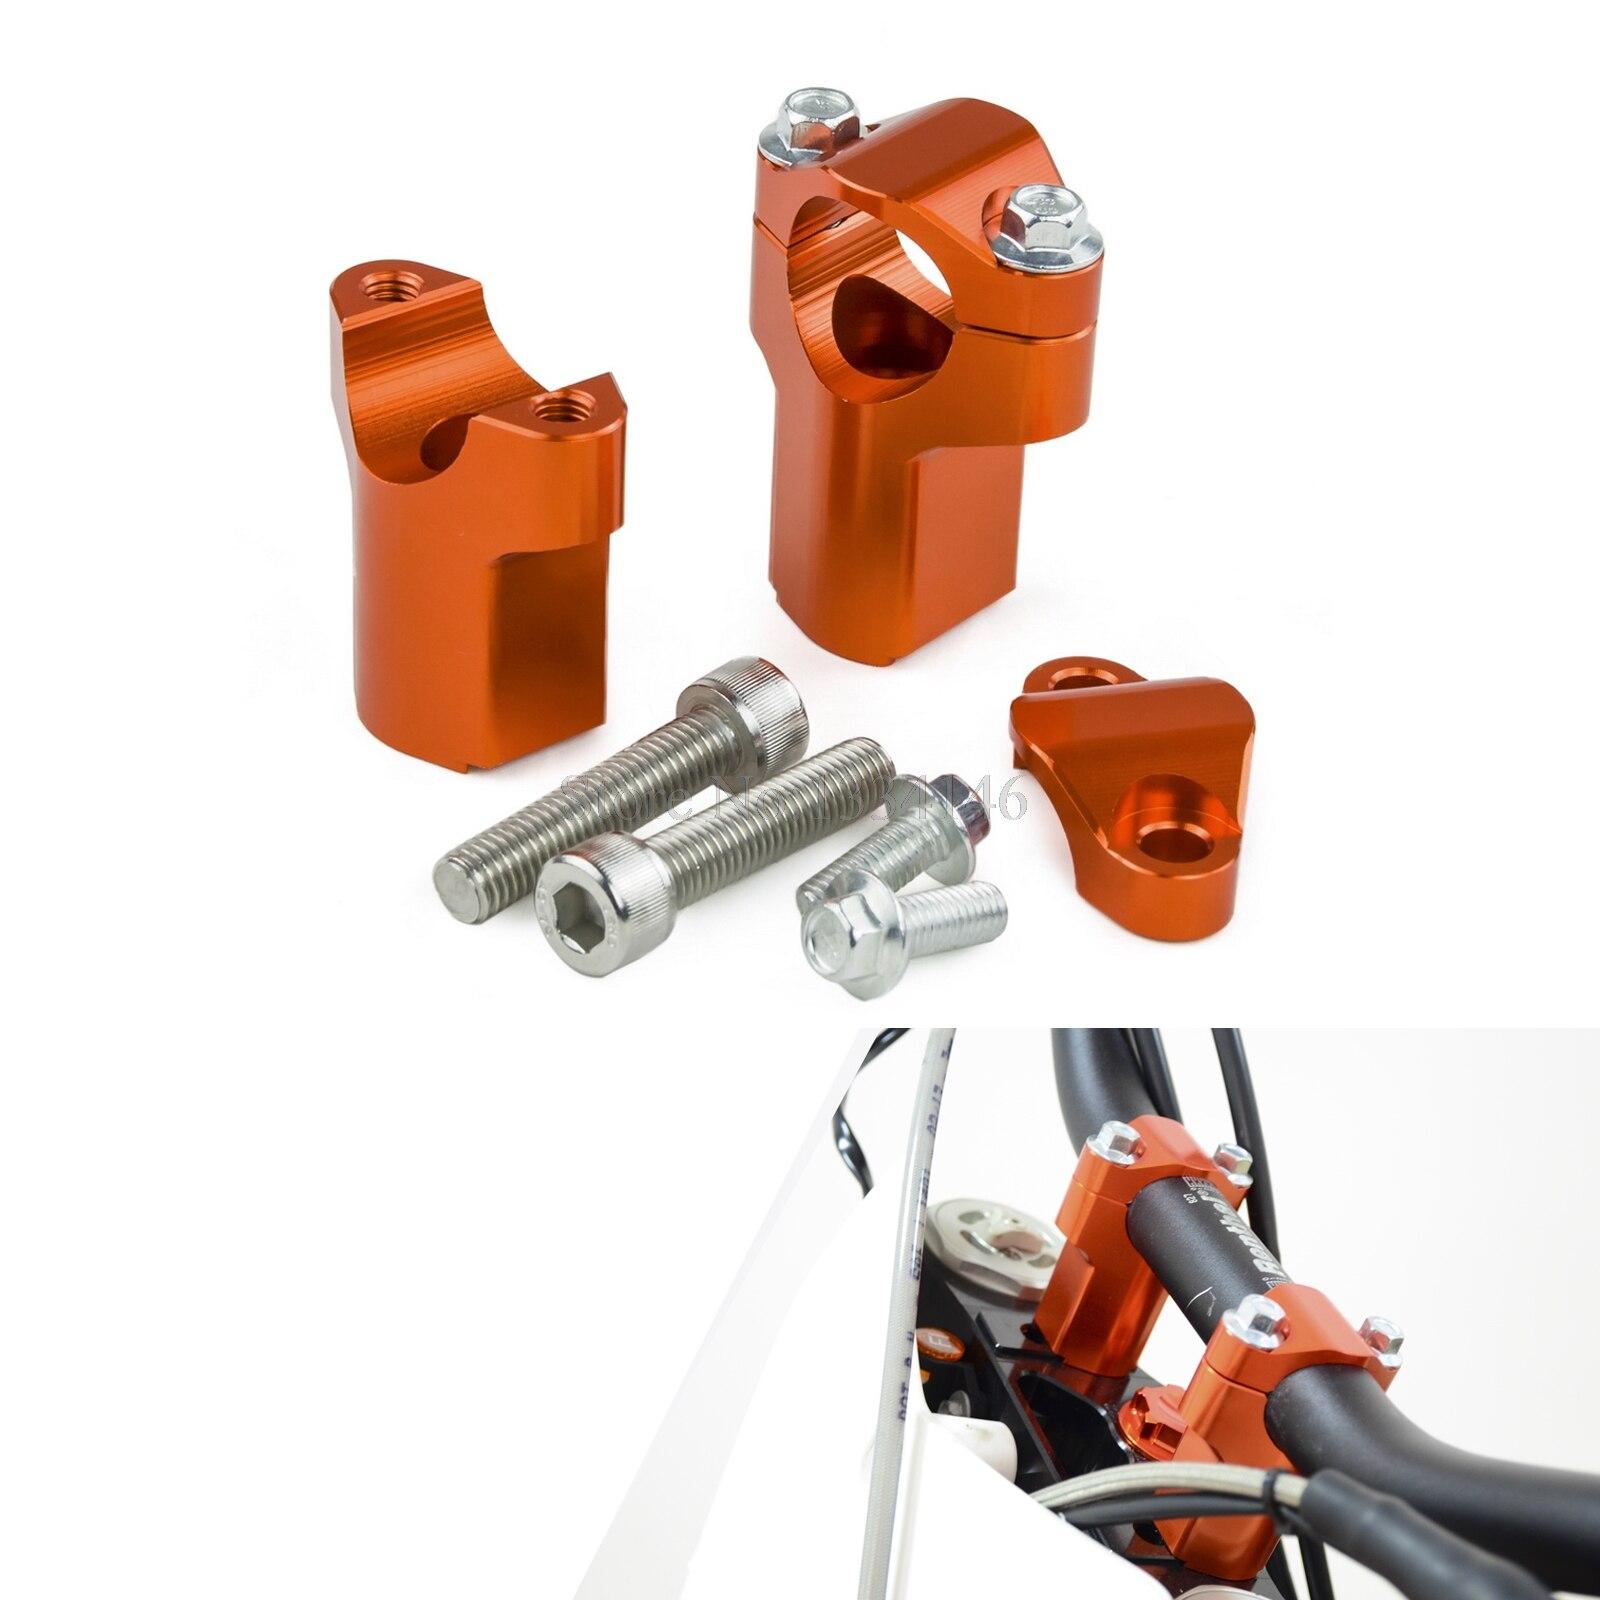 NICECNC Handlebar Riser Clamp For KTM 690 Enduro SMC SMCR 1190 1290 Super Adventure R Freeride Husqvarna TE 125 FE 250 350 450